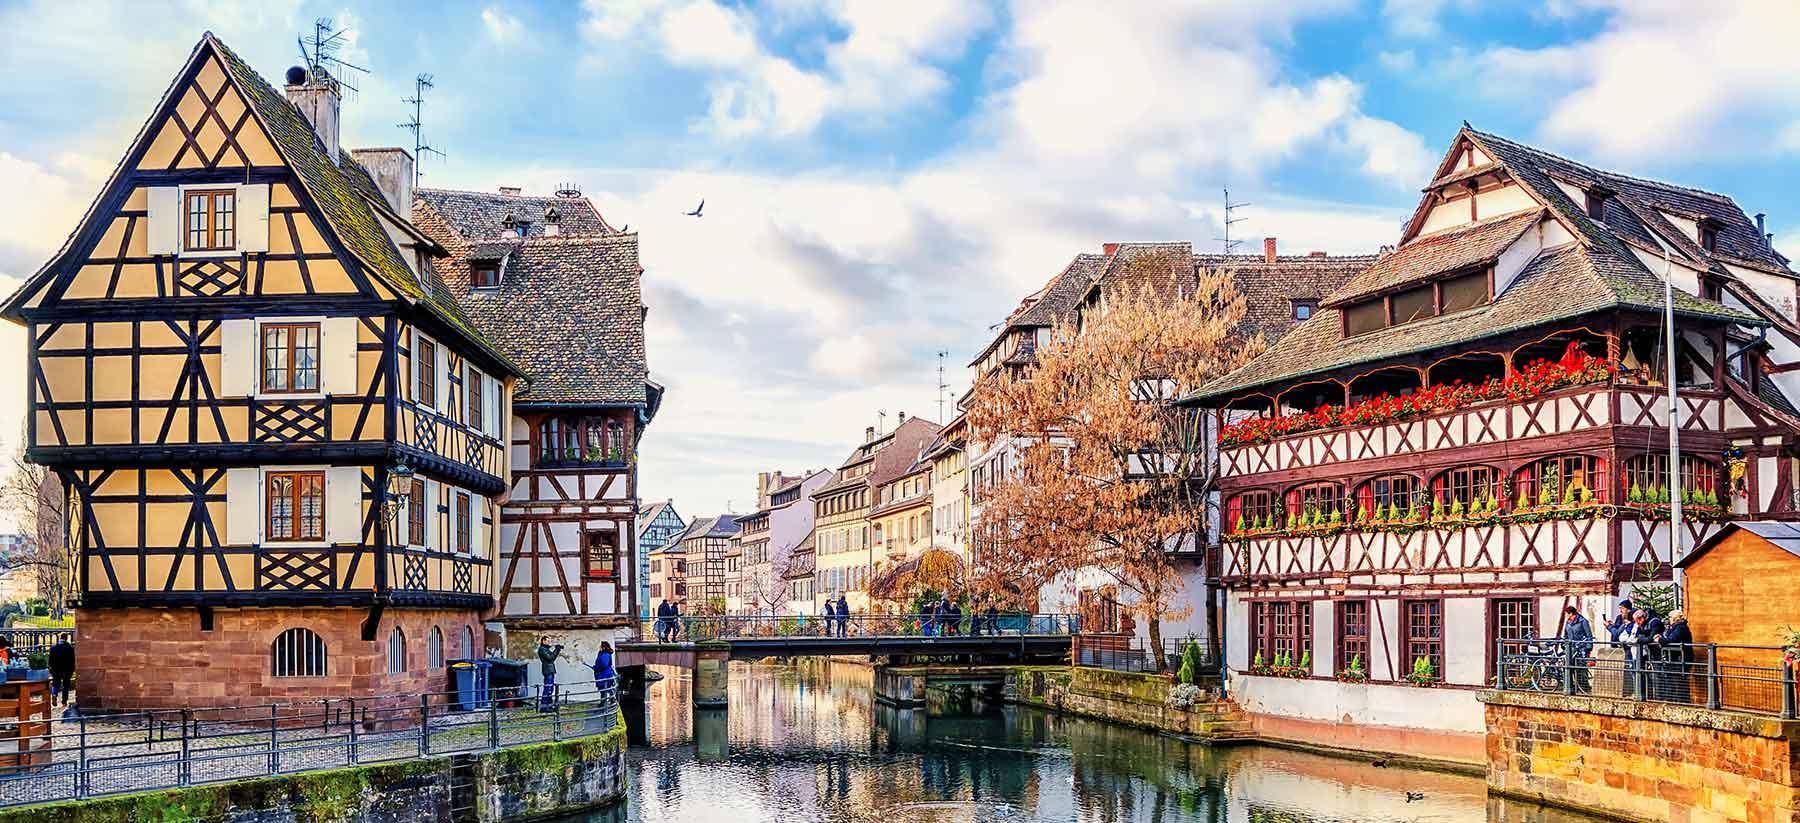 Les magasins Cyclable à Strasbourg